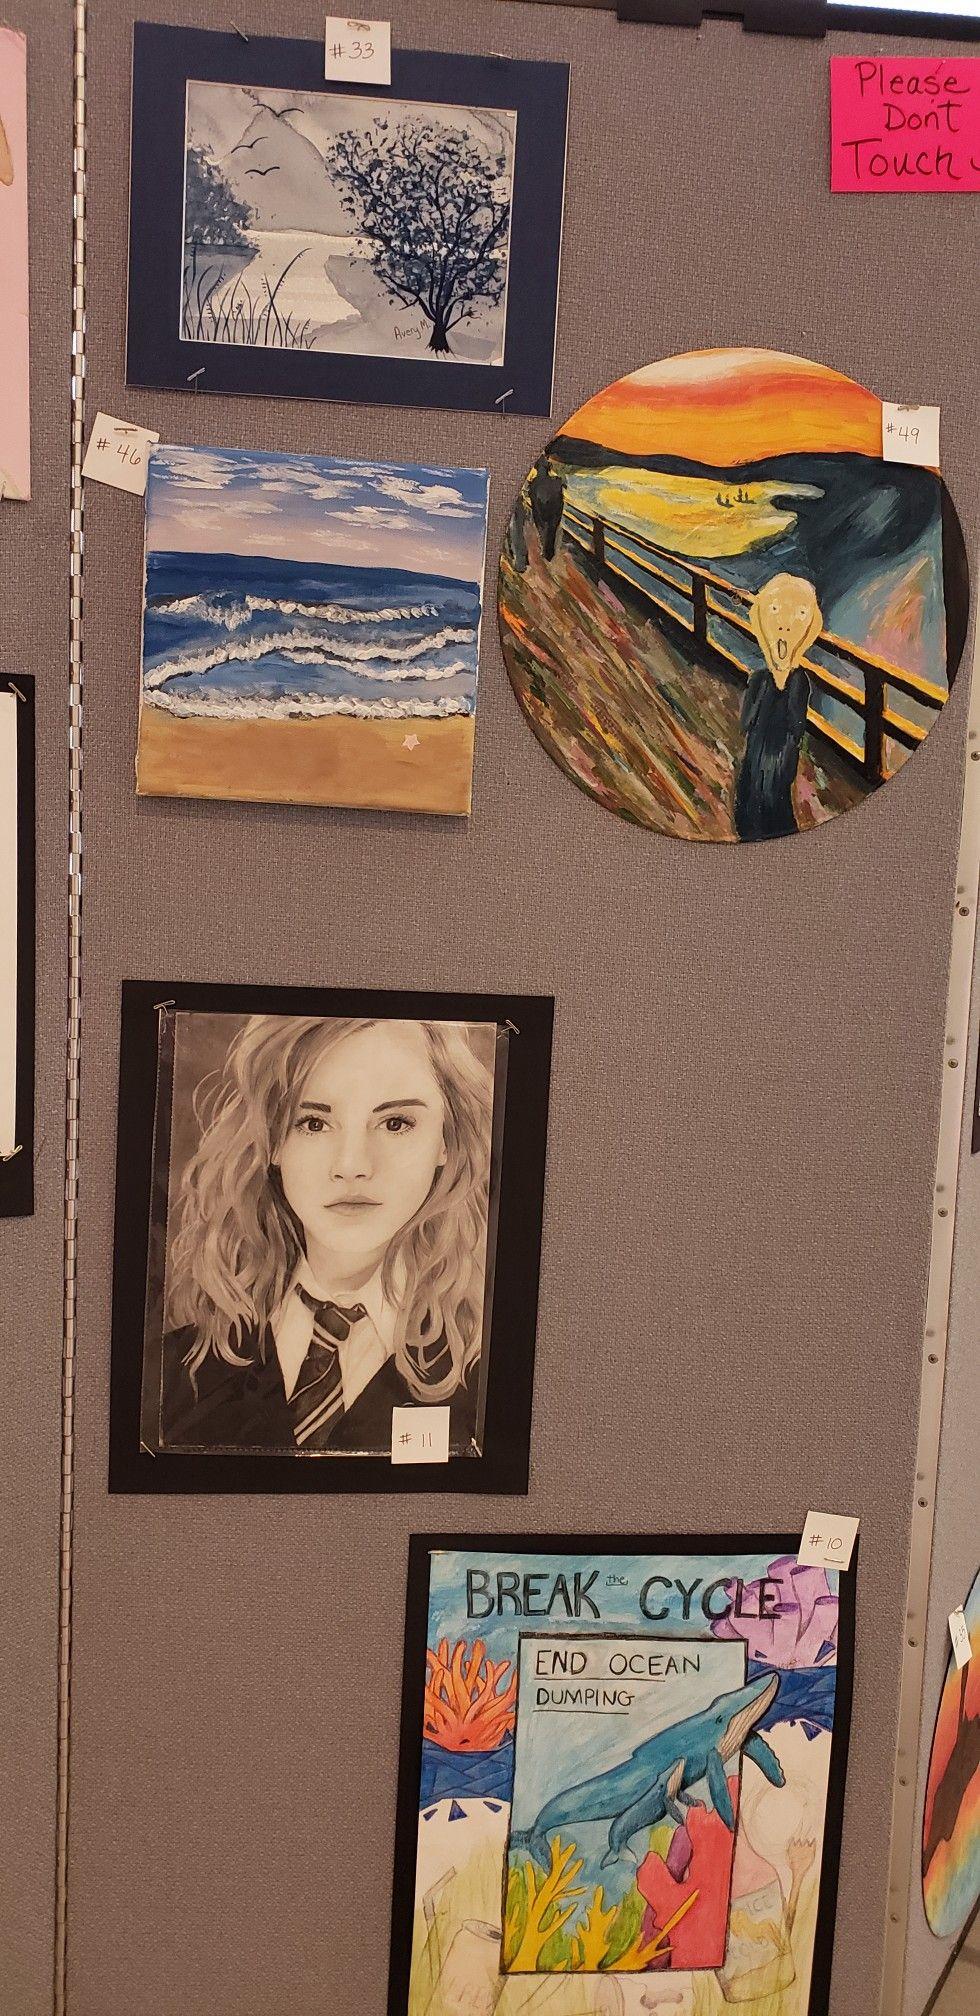 Lms art prize 2019 | Student Art LMS in 2019 | Art education